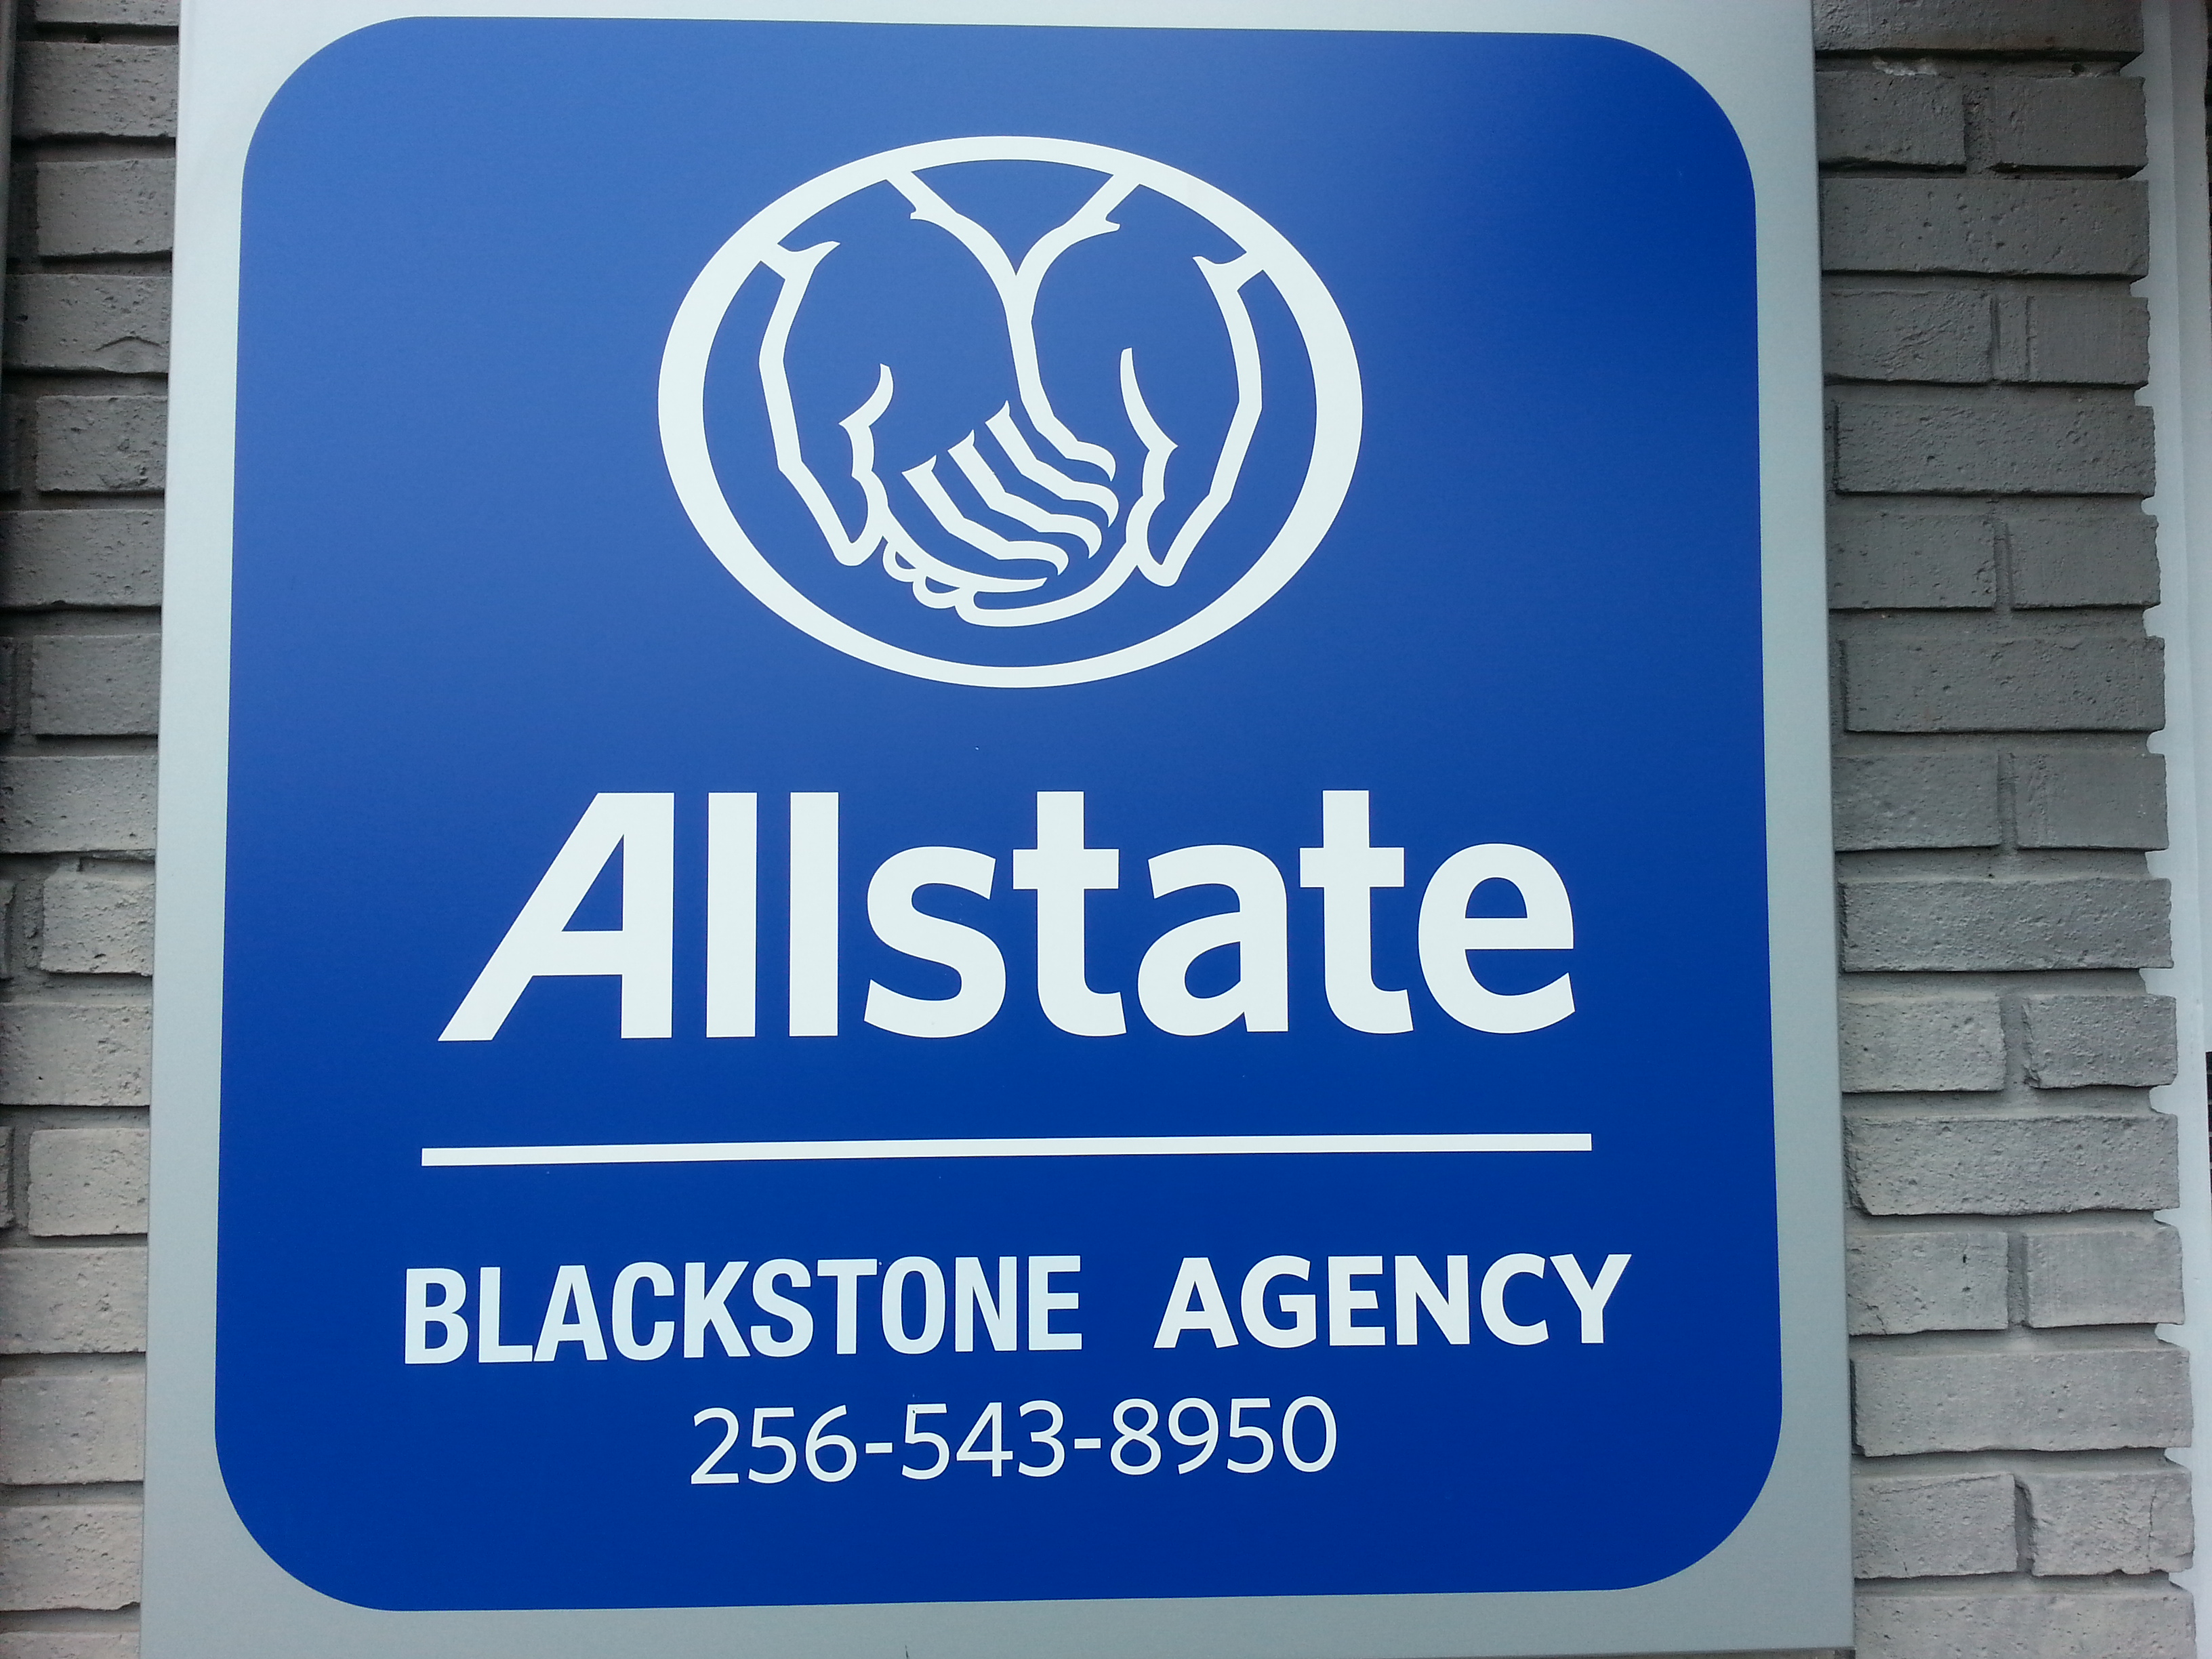 Scott Blackstone: Allstate Insurance image 3